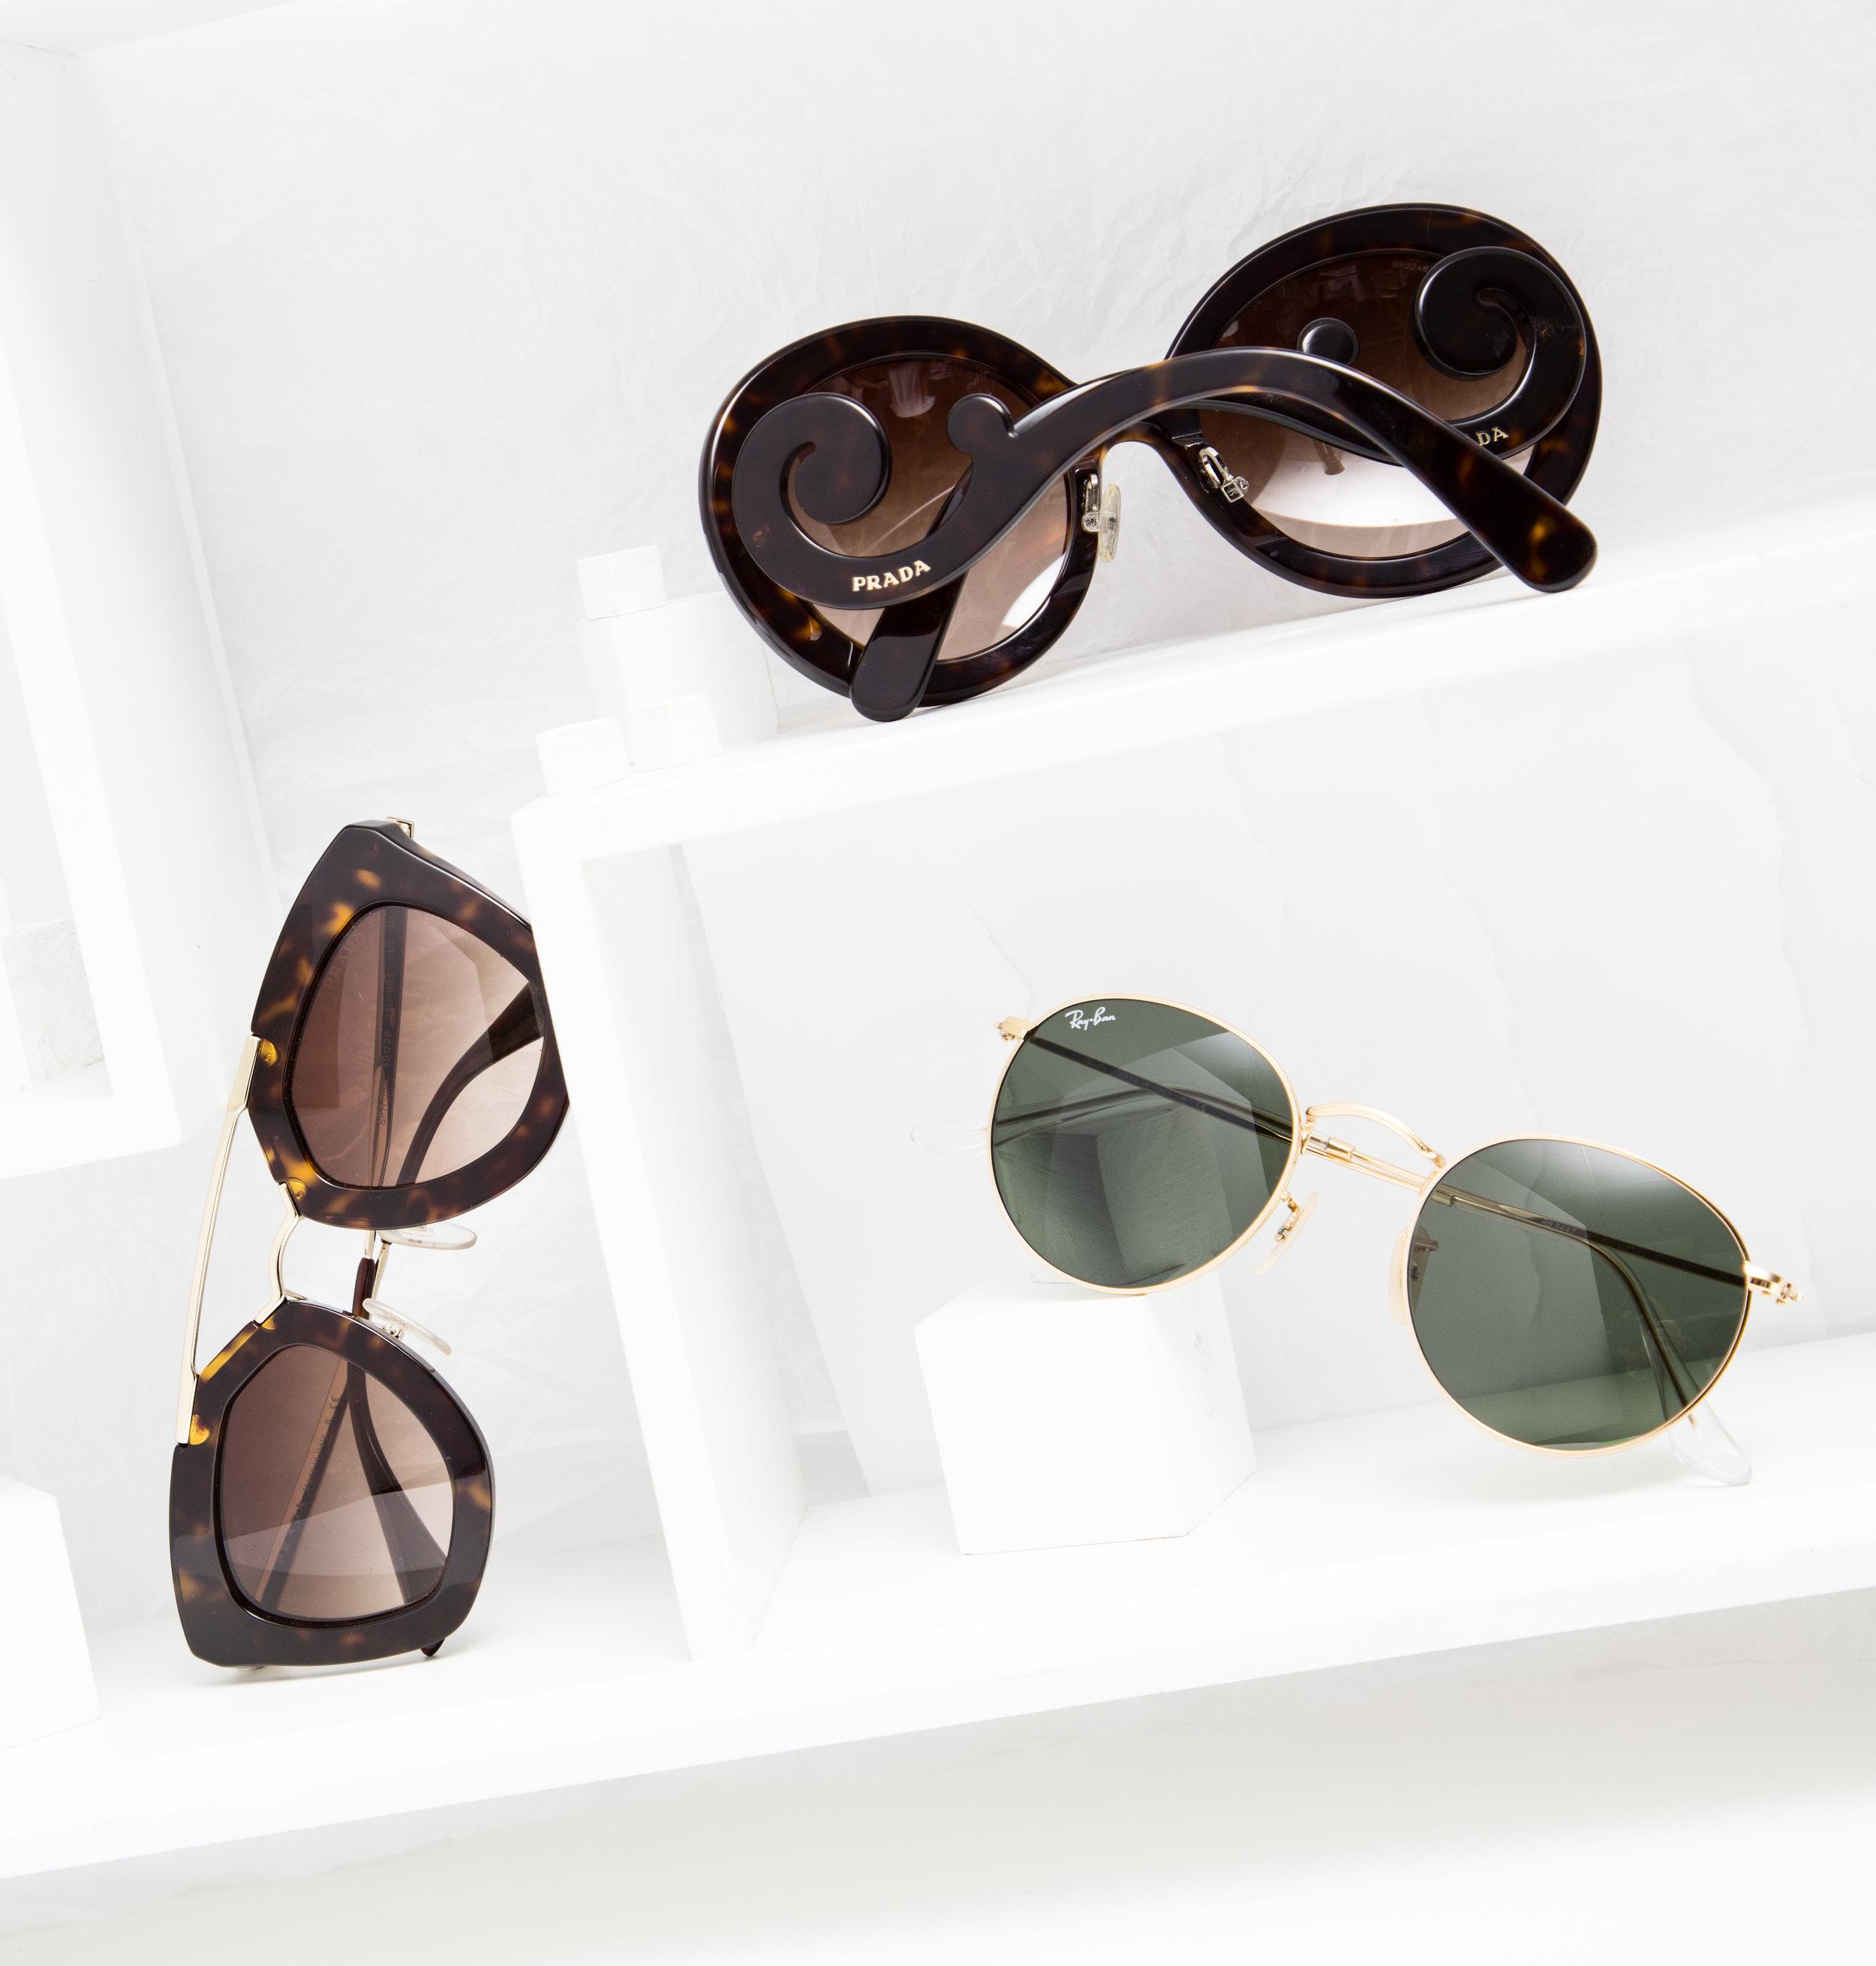 Photography by Danielle Rueda, MFA Photography. Styling by Nakia Pleasant, BFA Fashion Styling, and Irene Kim, BFA2 Visual Merchandising. Sunglasses by Prada and Ray Ban.